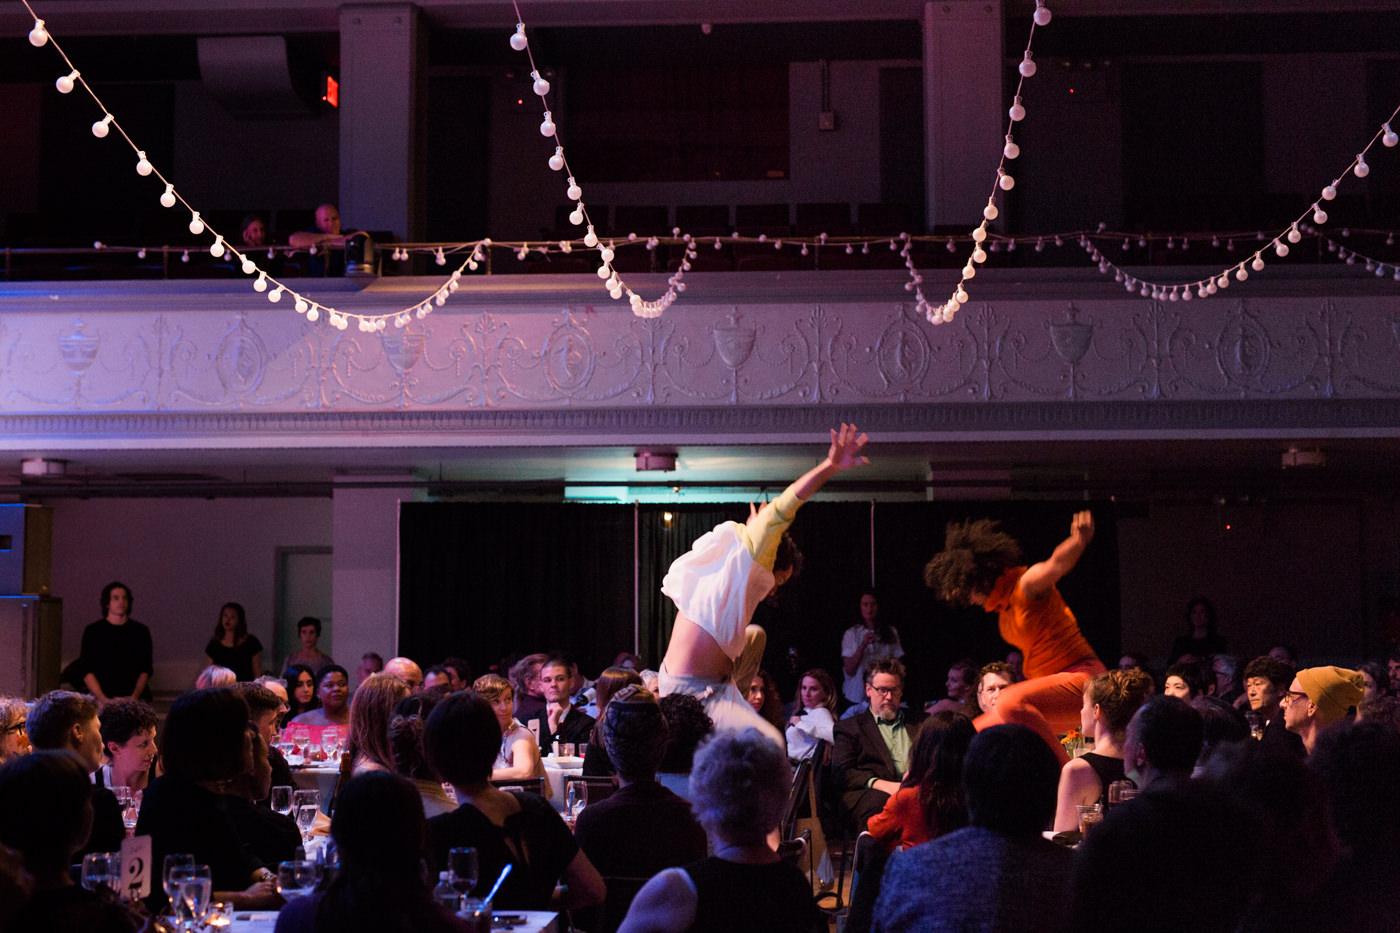 Mt Tremper Arts Gala -  NYC event photographer Kamp Weddings-12.jpg